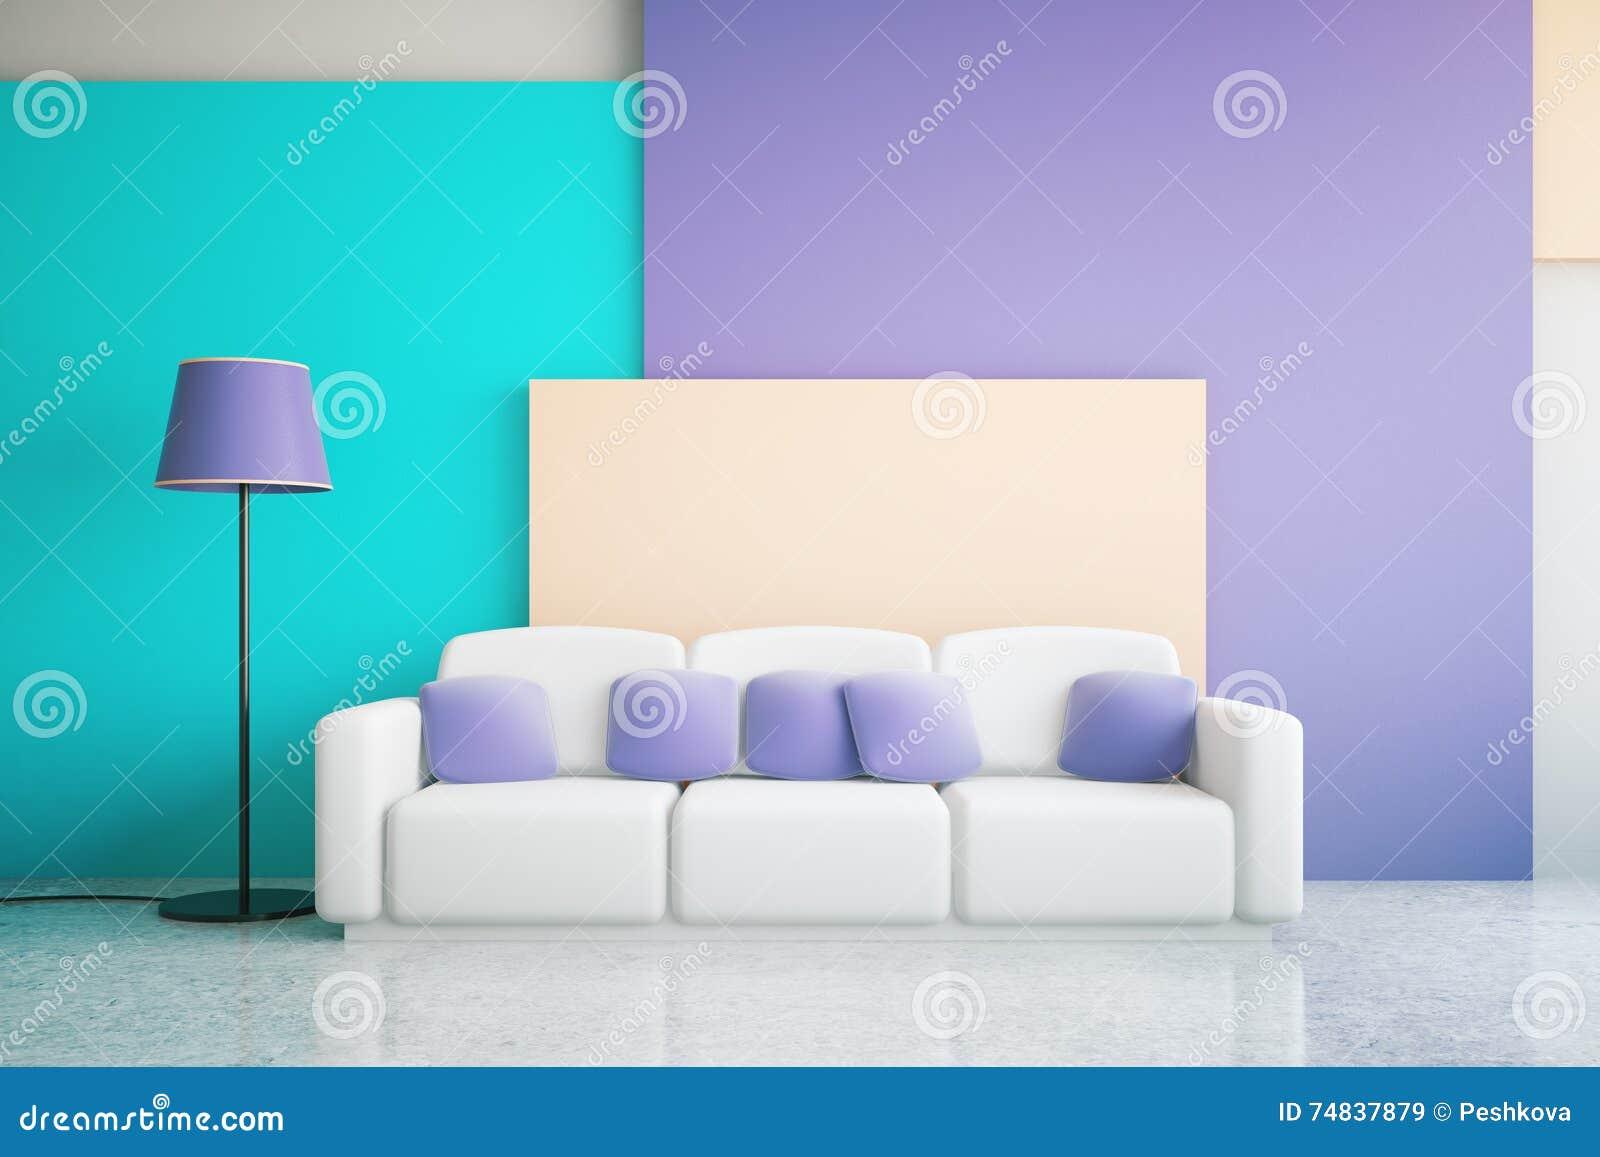 Blue And Purple Room Interior Stock Illustration ...